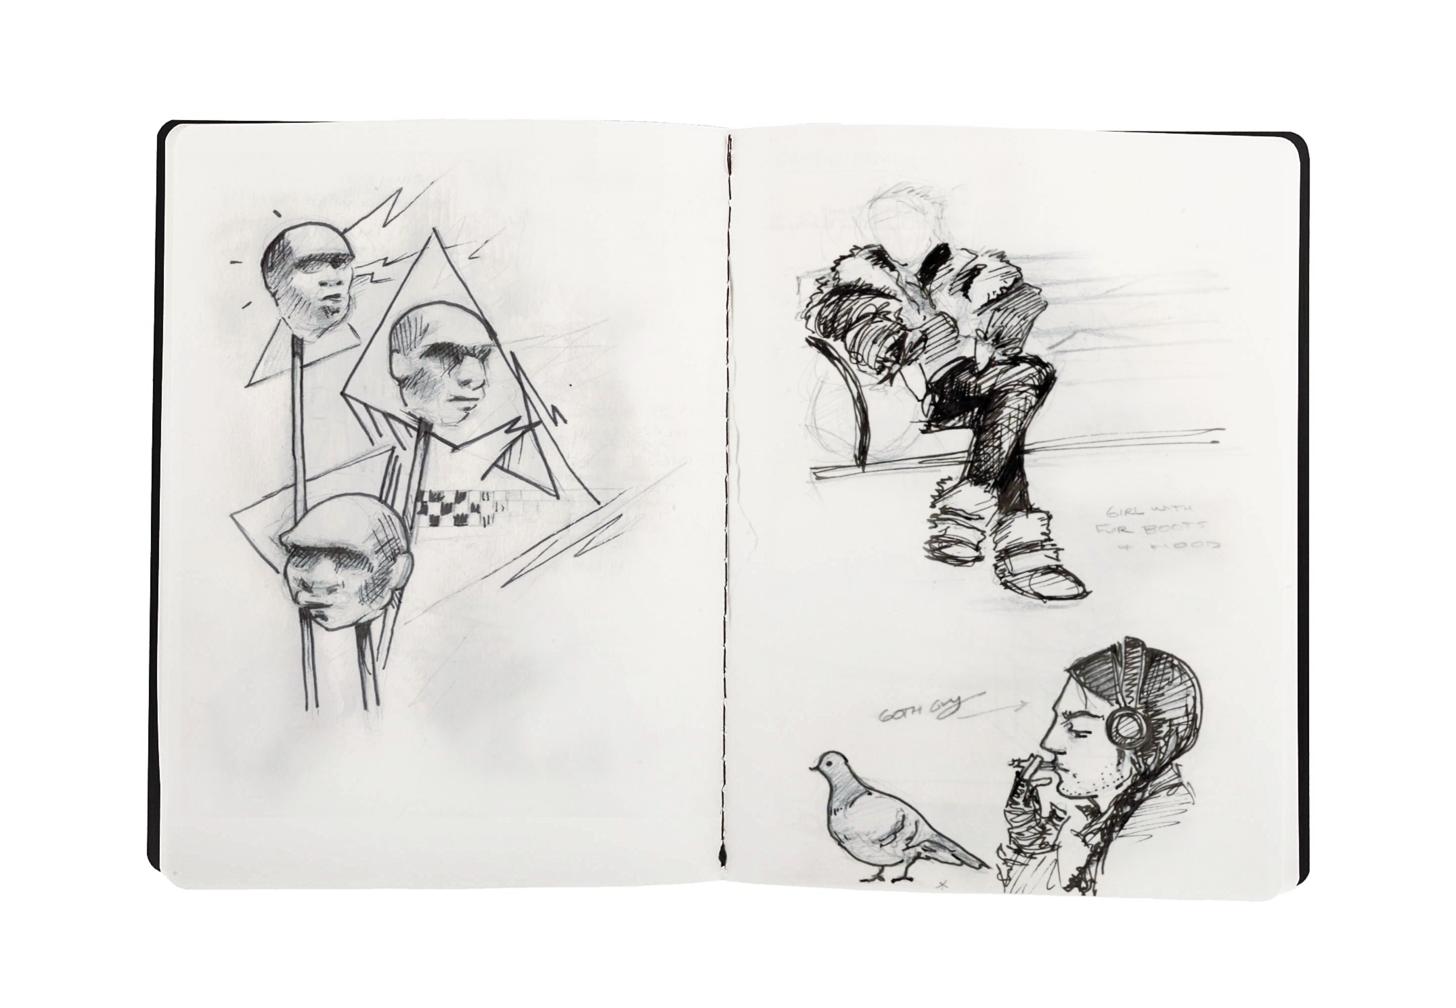 Sketchbook5.png